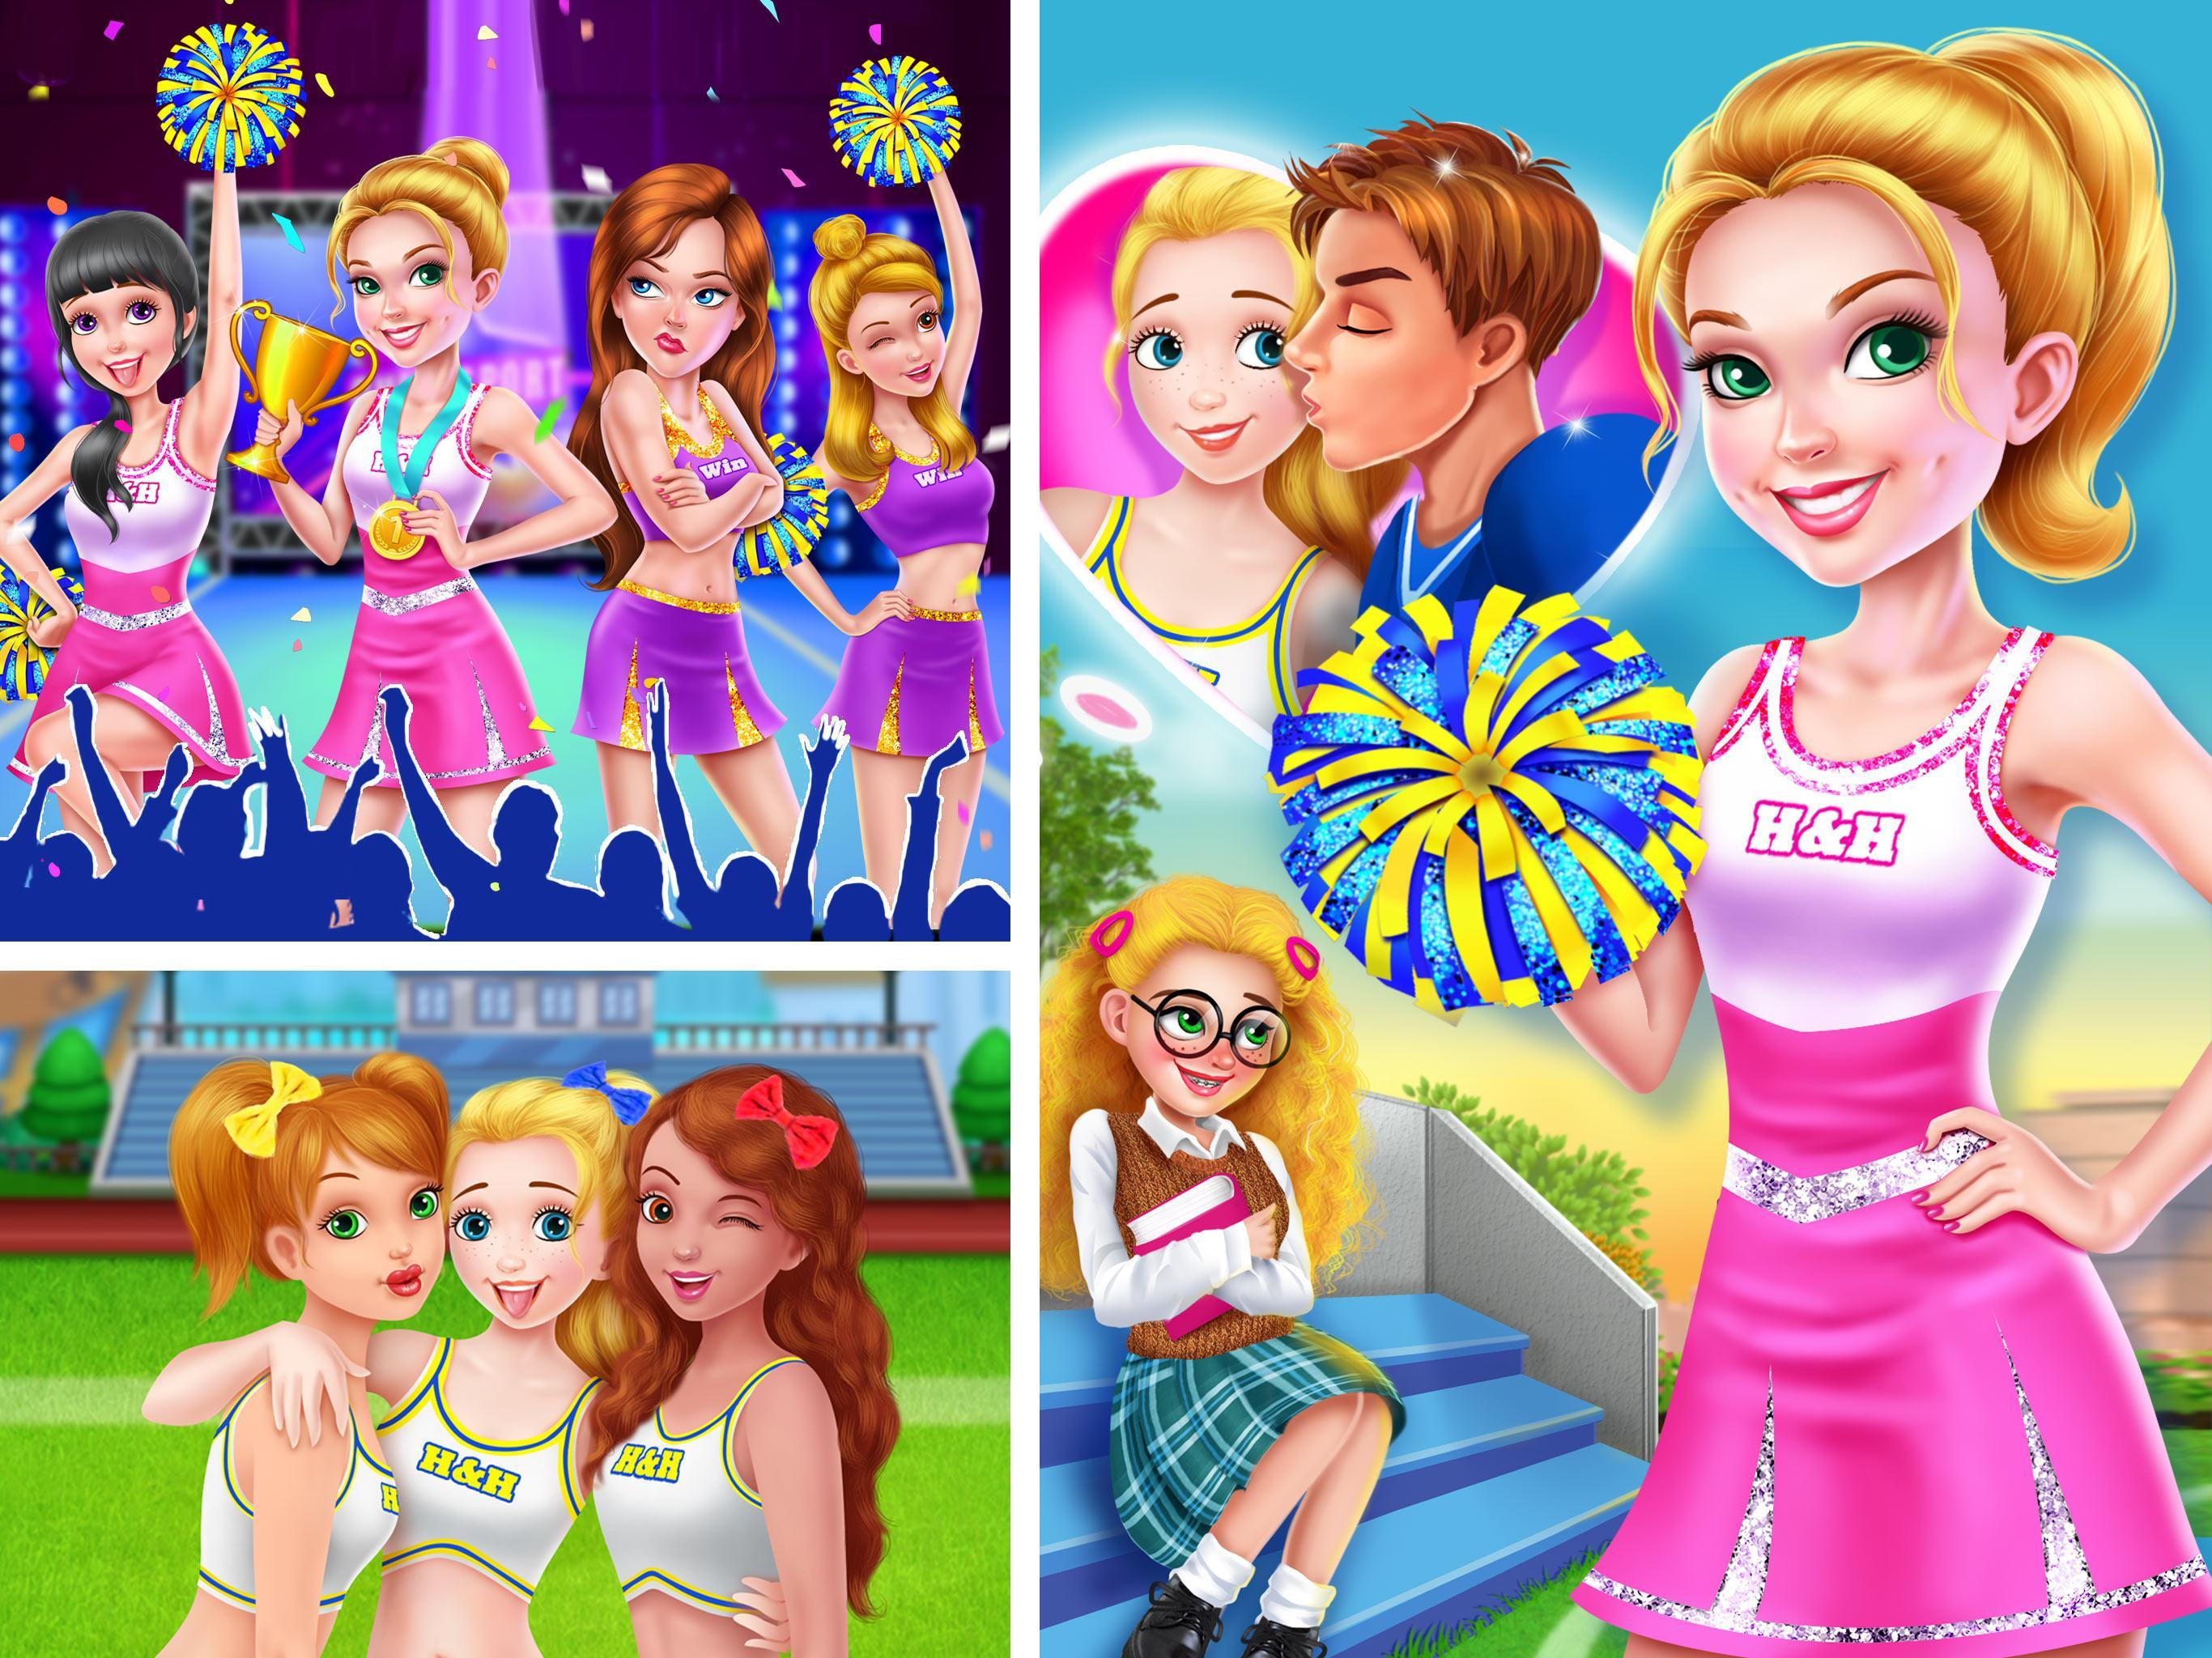 Girl Games: Dress Up, Makeup, Salon Game for Girls for